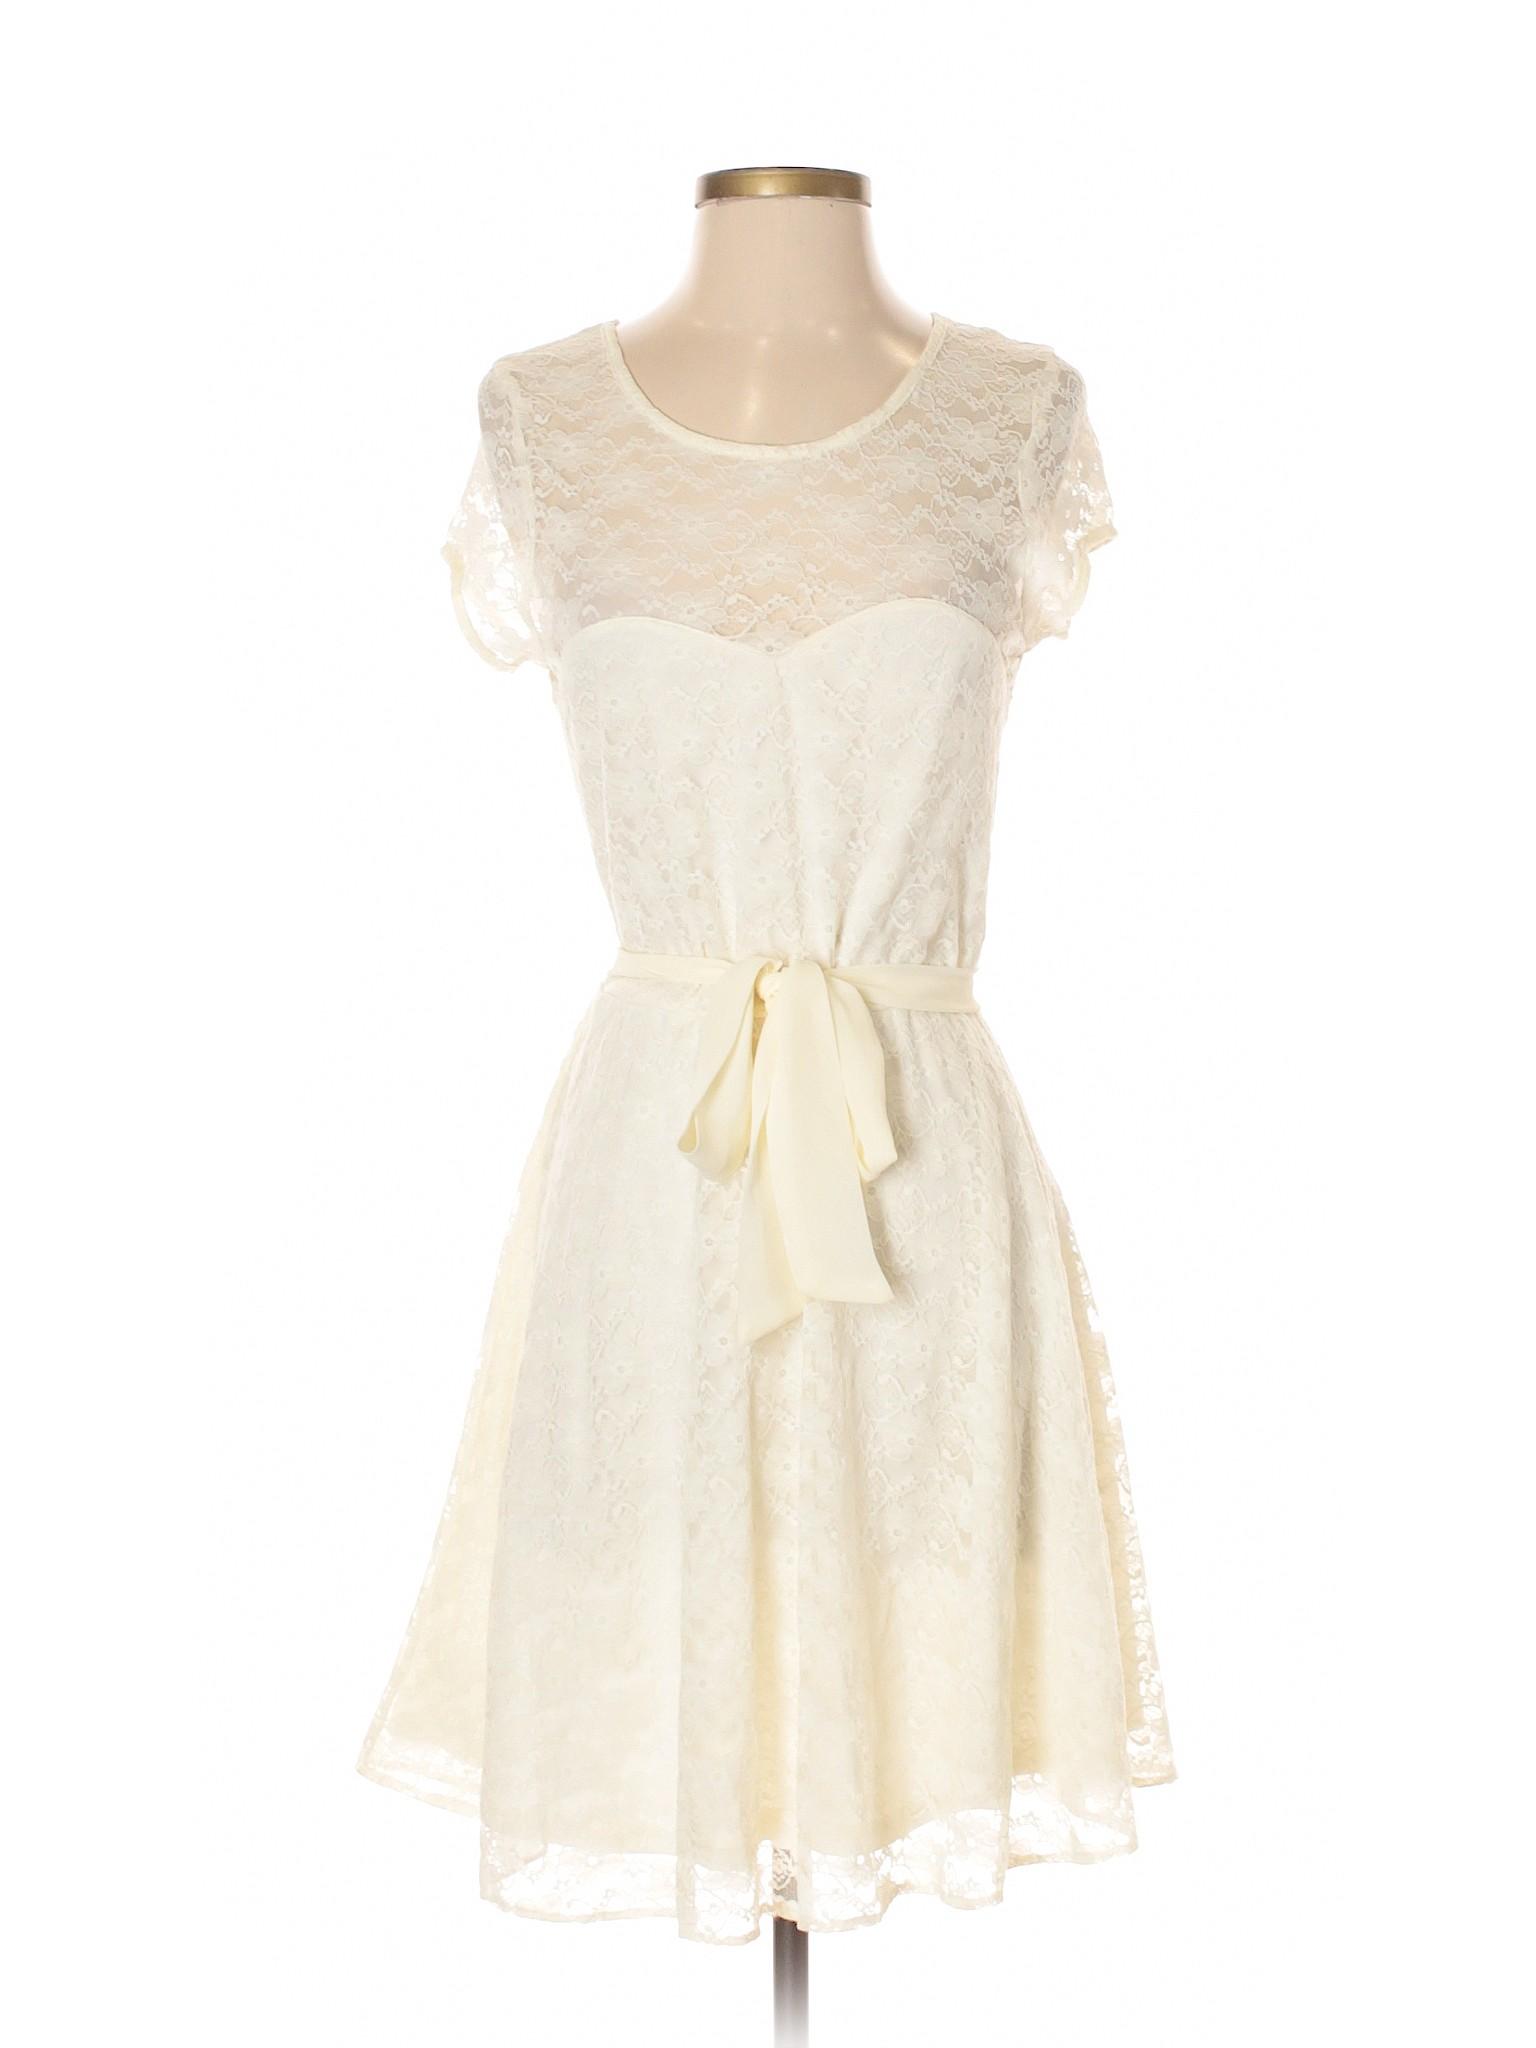 Boutique winter Boutique winter Dress ASOS Casual pSE5nqwv